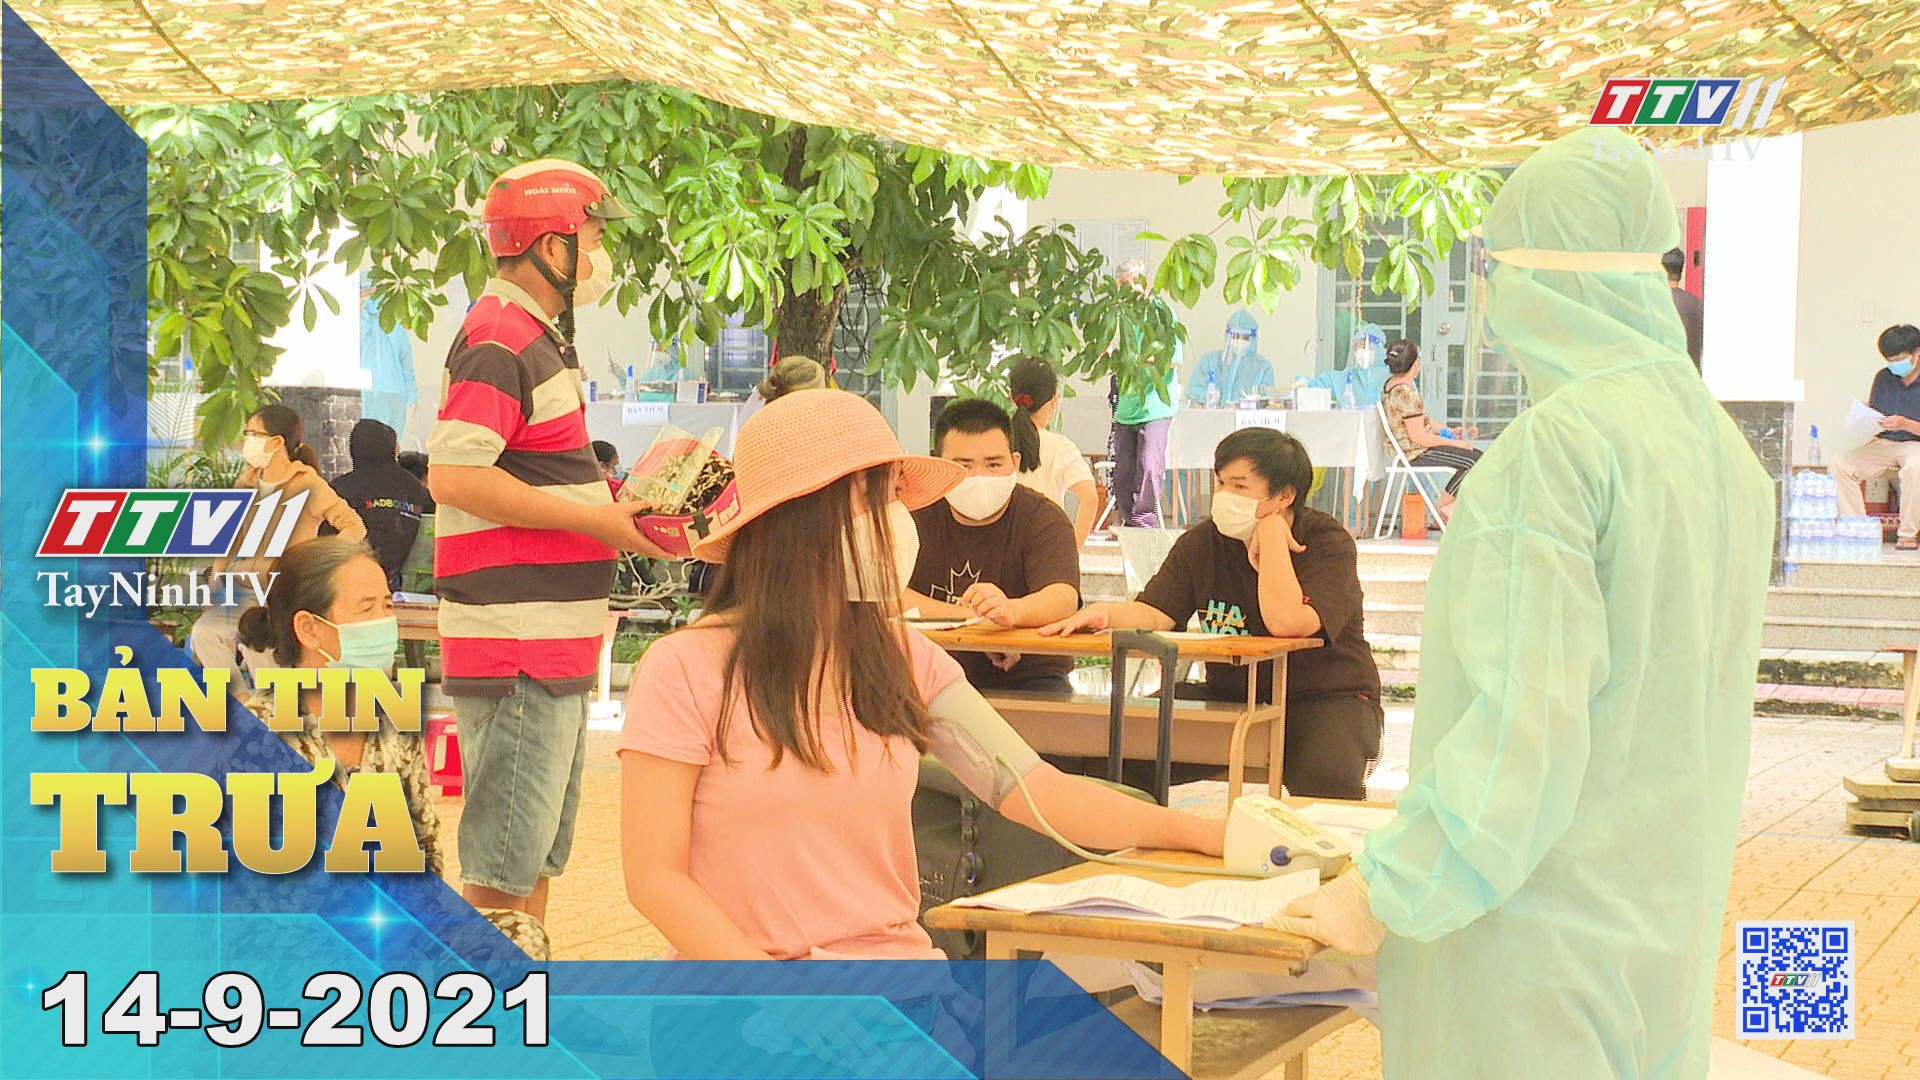 Bản tin trưa 14-9-2021 | Tin tức hôm nay | TayNinhTV